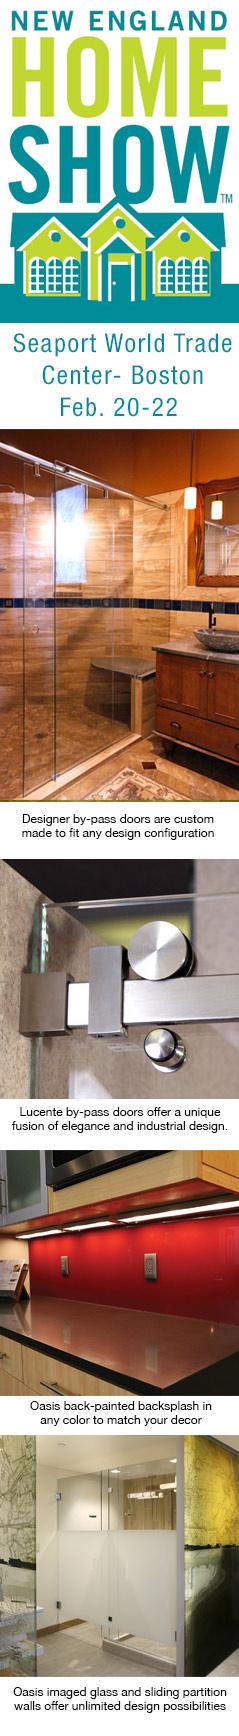 Frameless Slider, by-pass doors, glass backsplash, Sliding partition walls